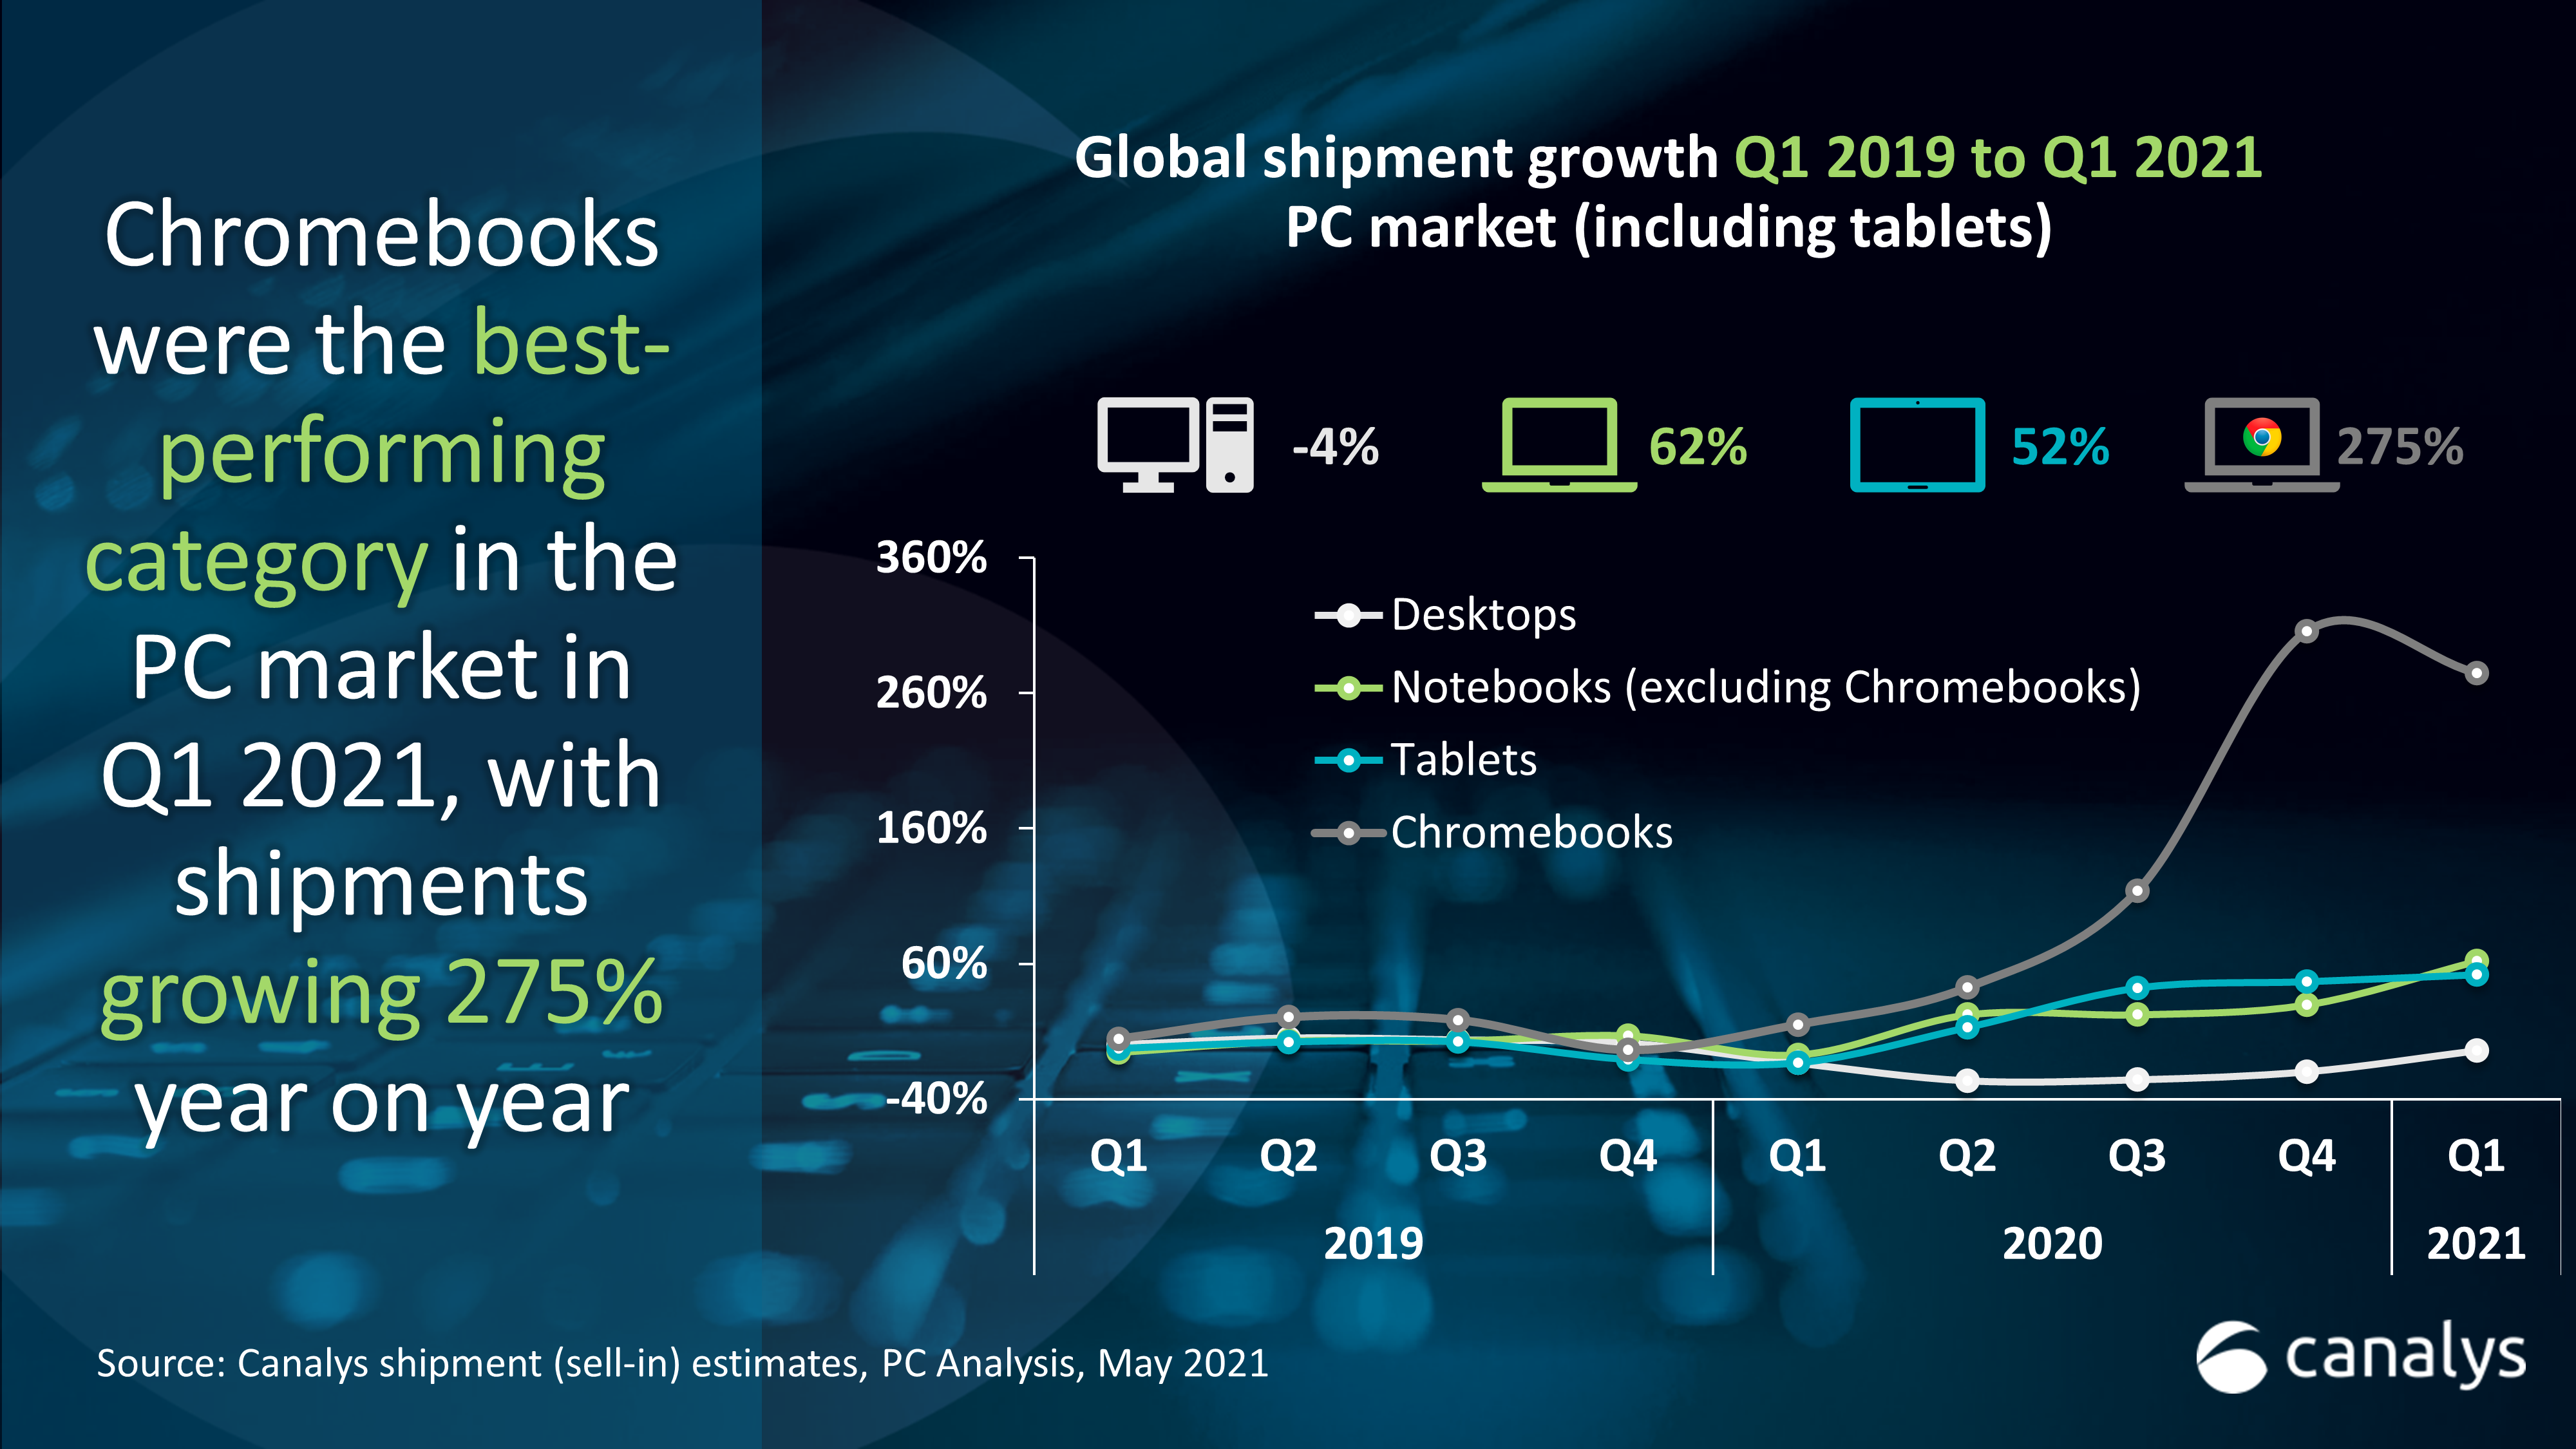 Chromebook shipments grew 275% in Q1